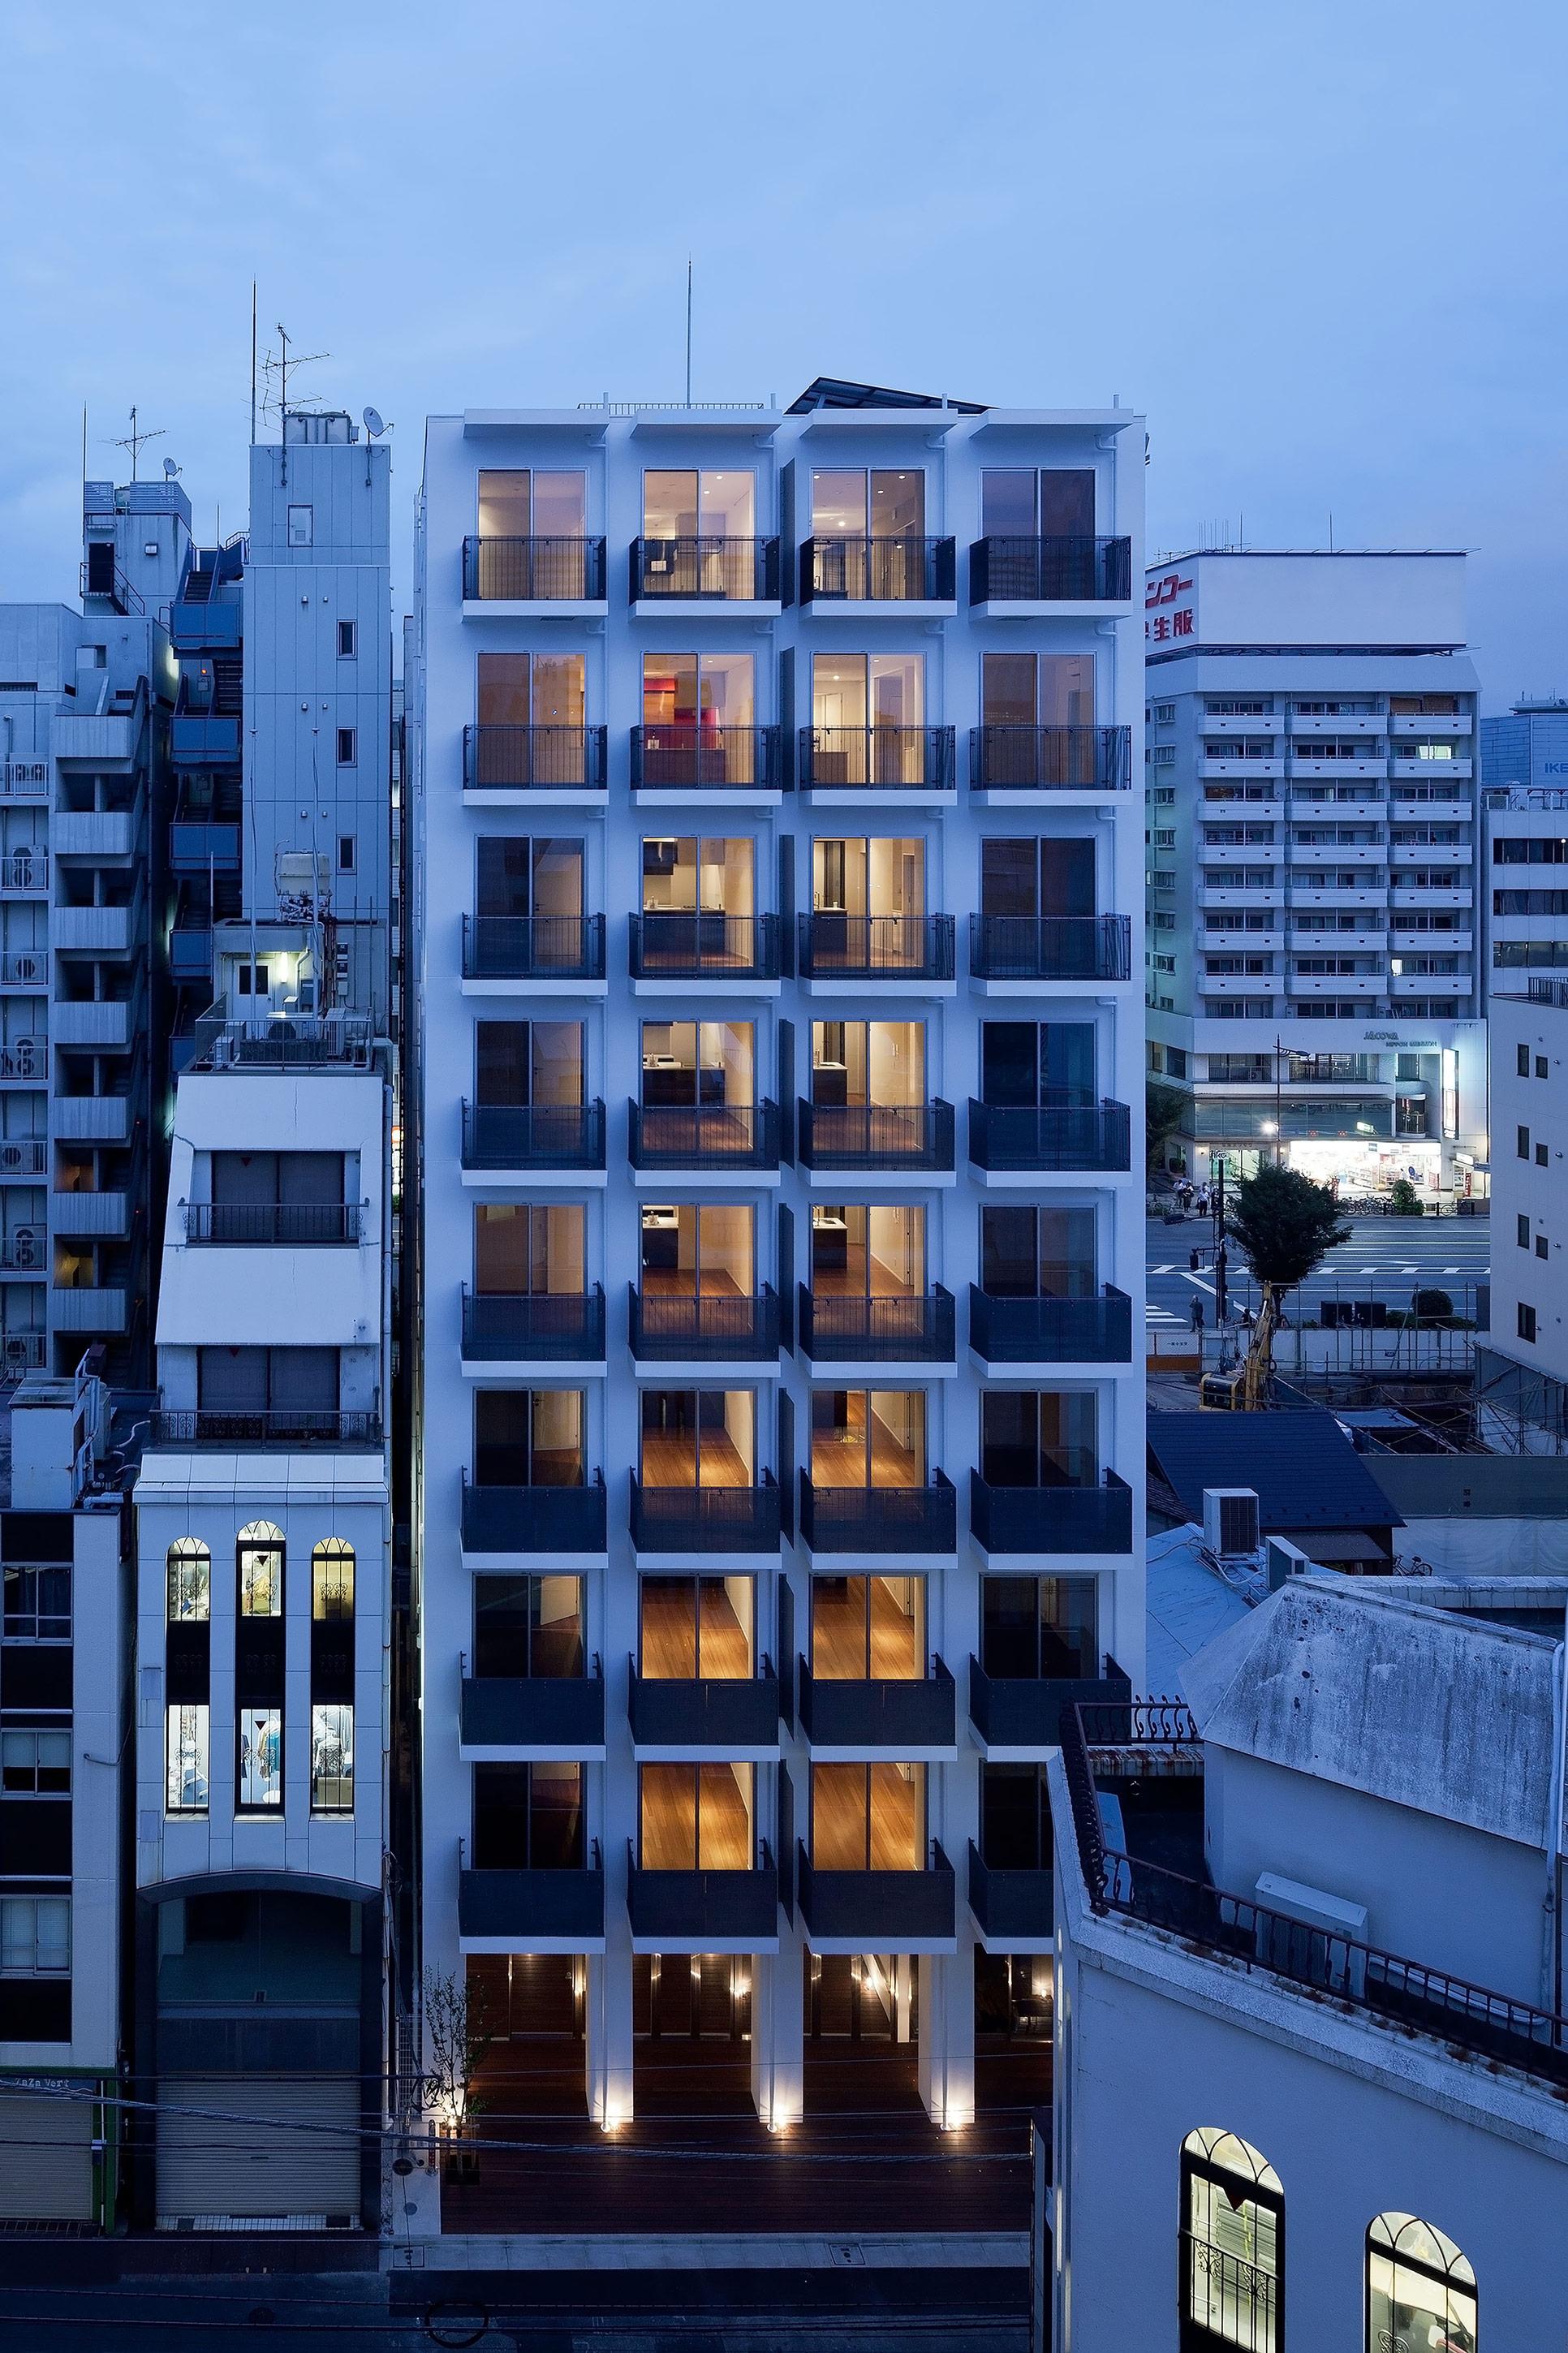 GREEN PARK 東日本橋 SQUARE   マンションギャラリー